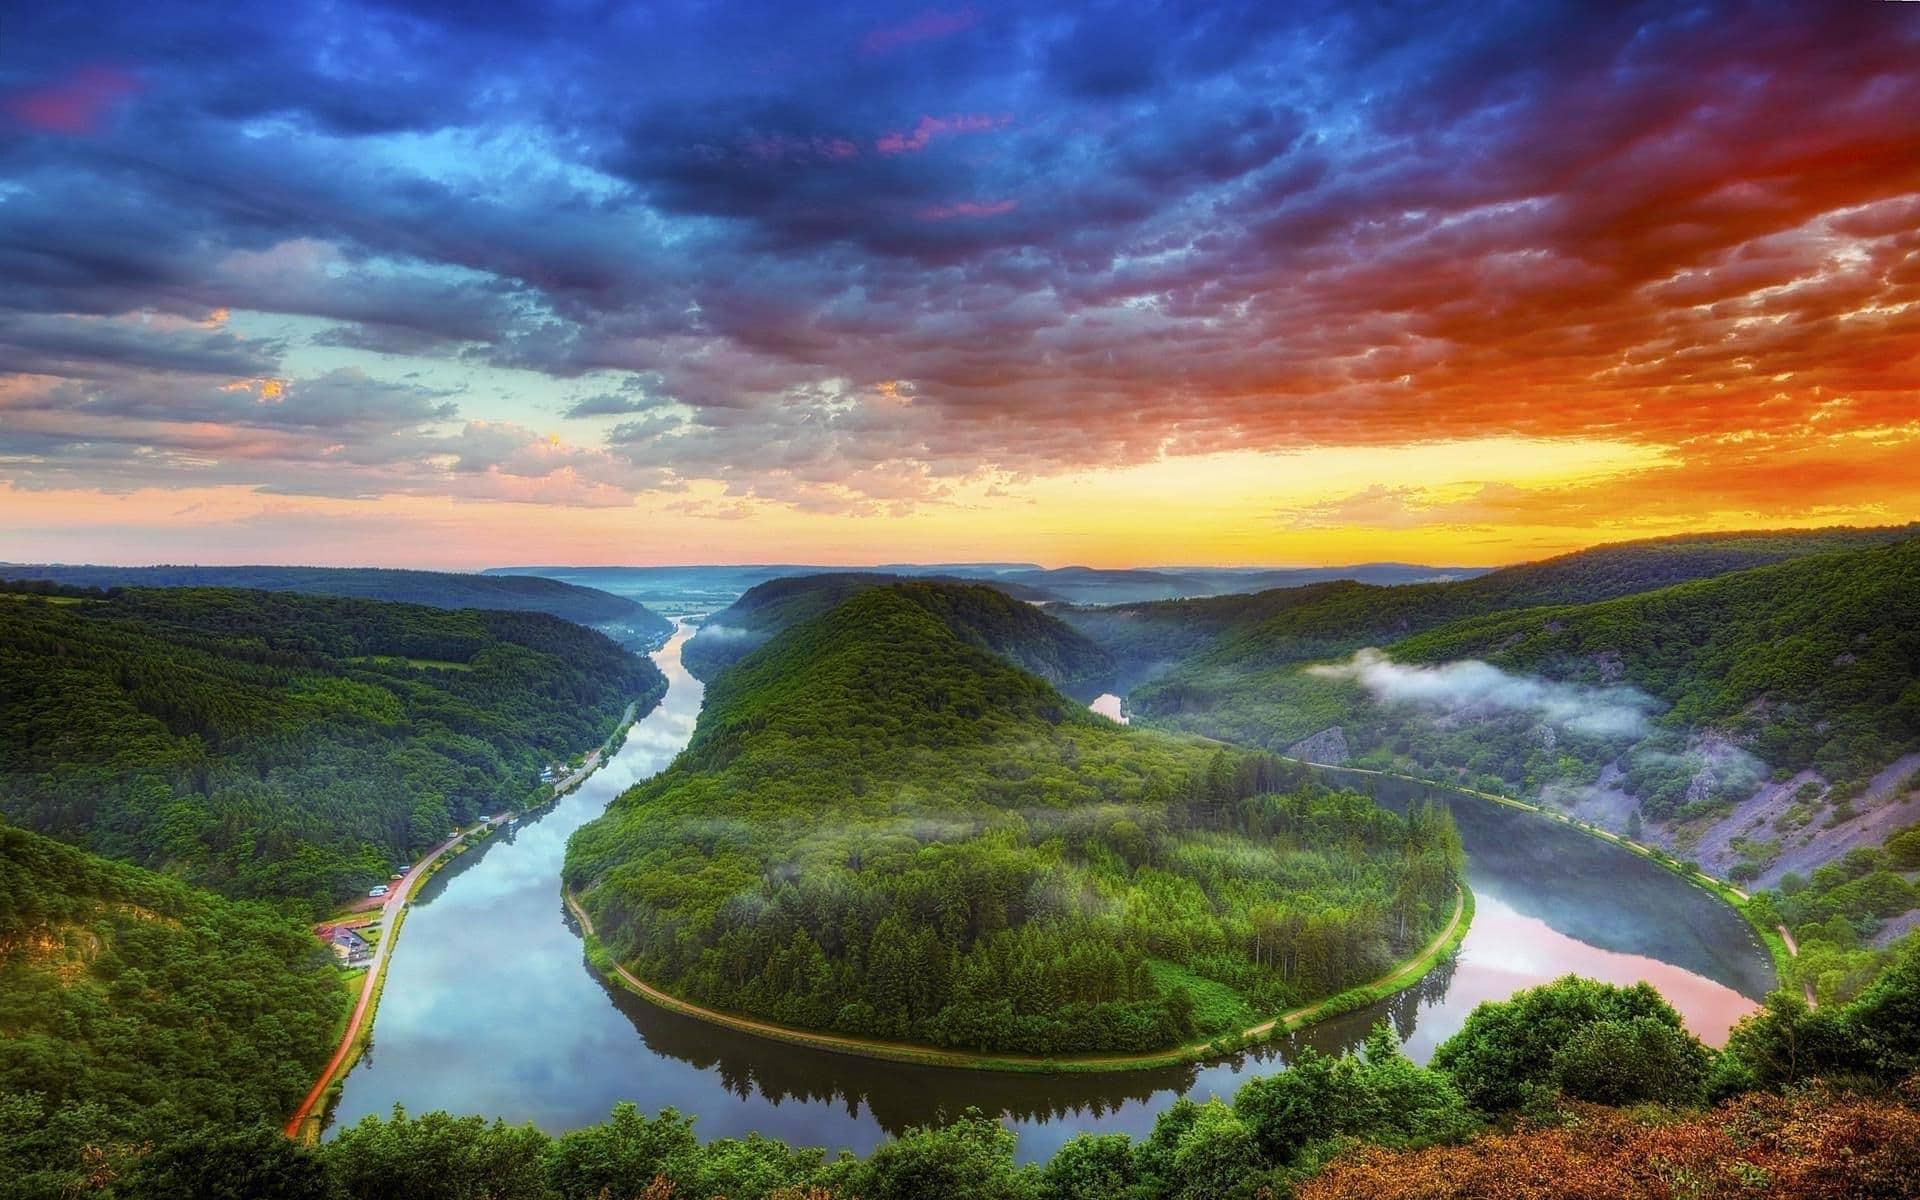 river dream meaning, dream about river, river dream interpretation, seeing in a dream river